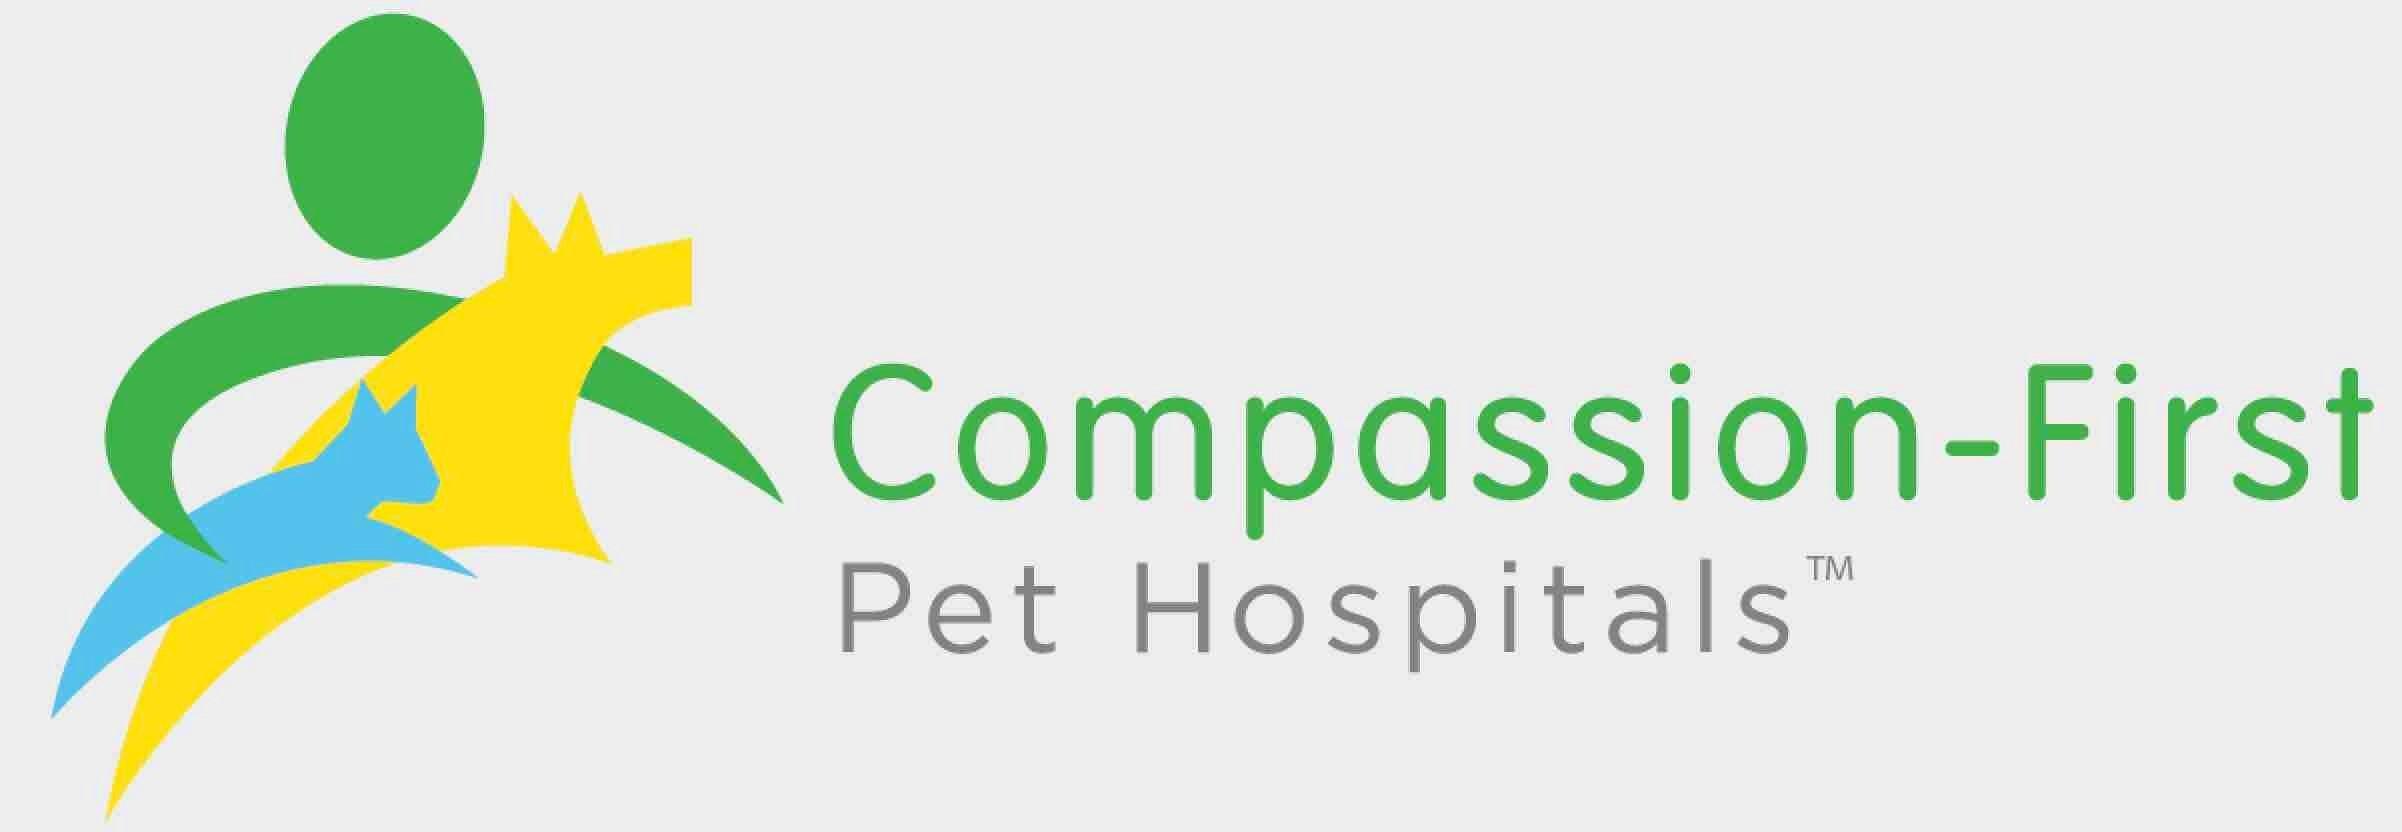 Compassion-First Pet Hospitals